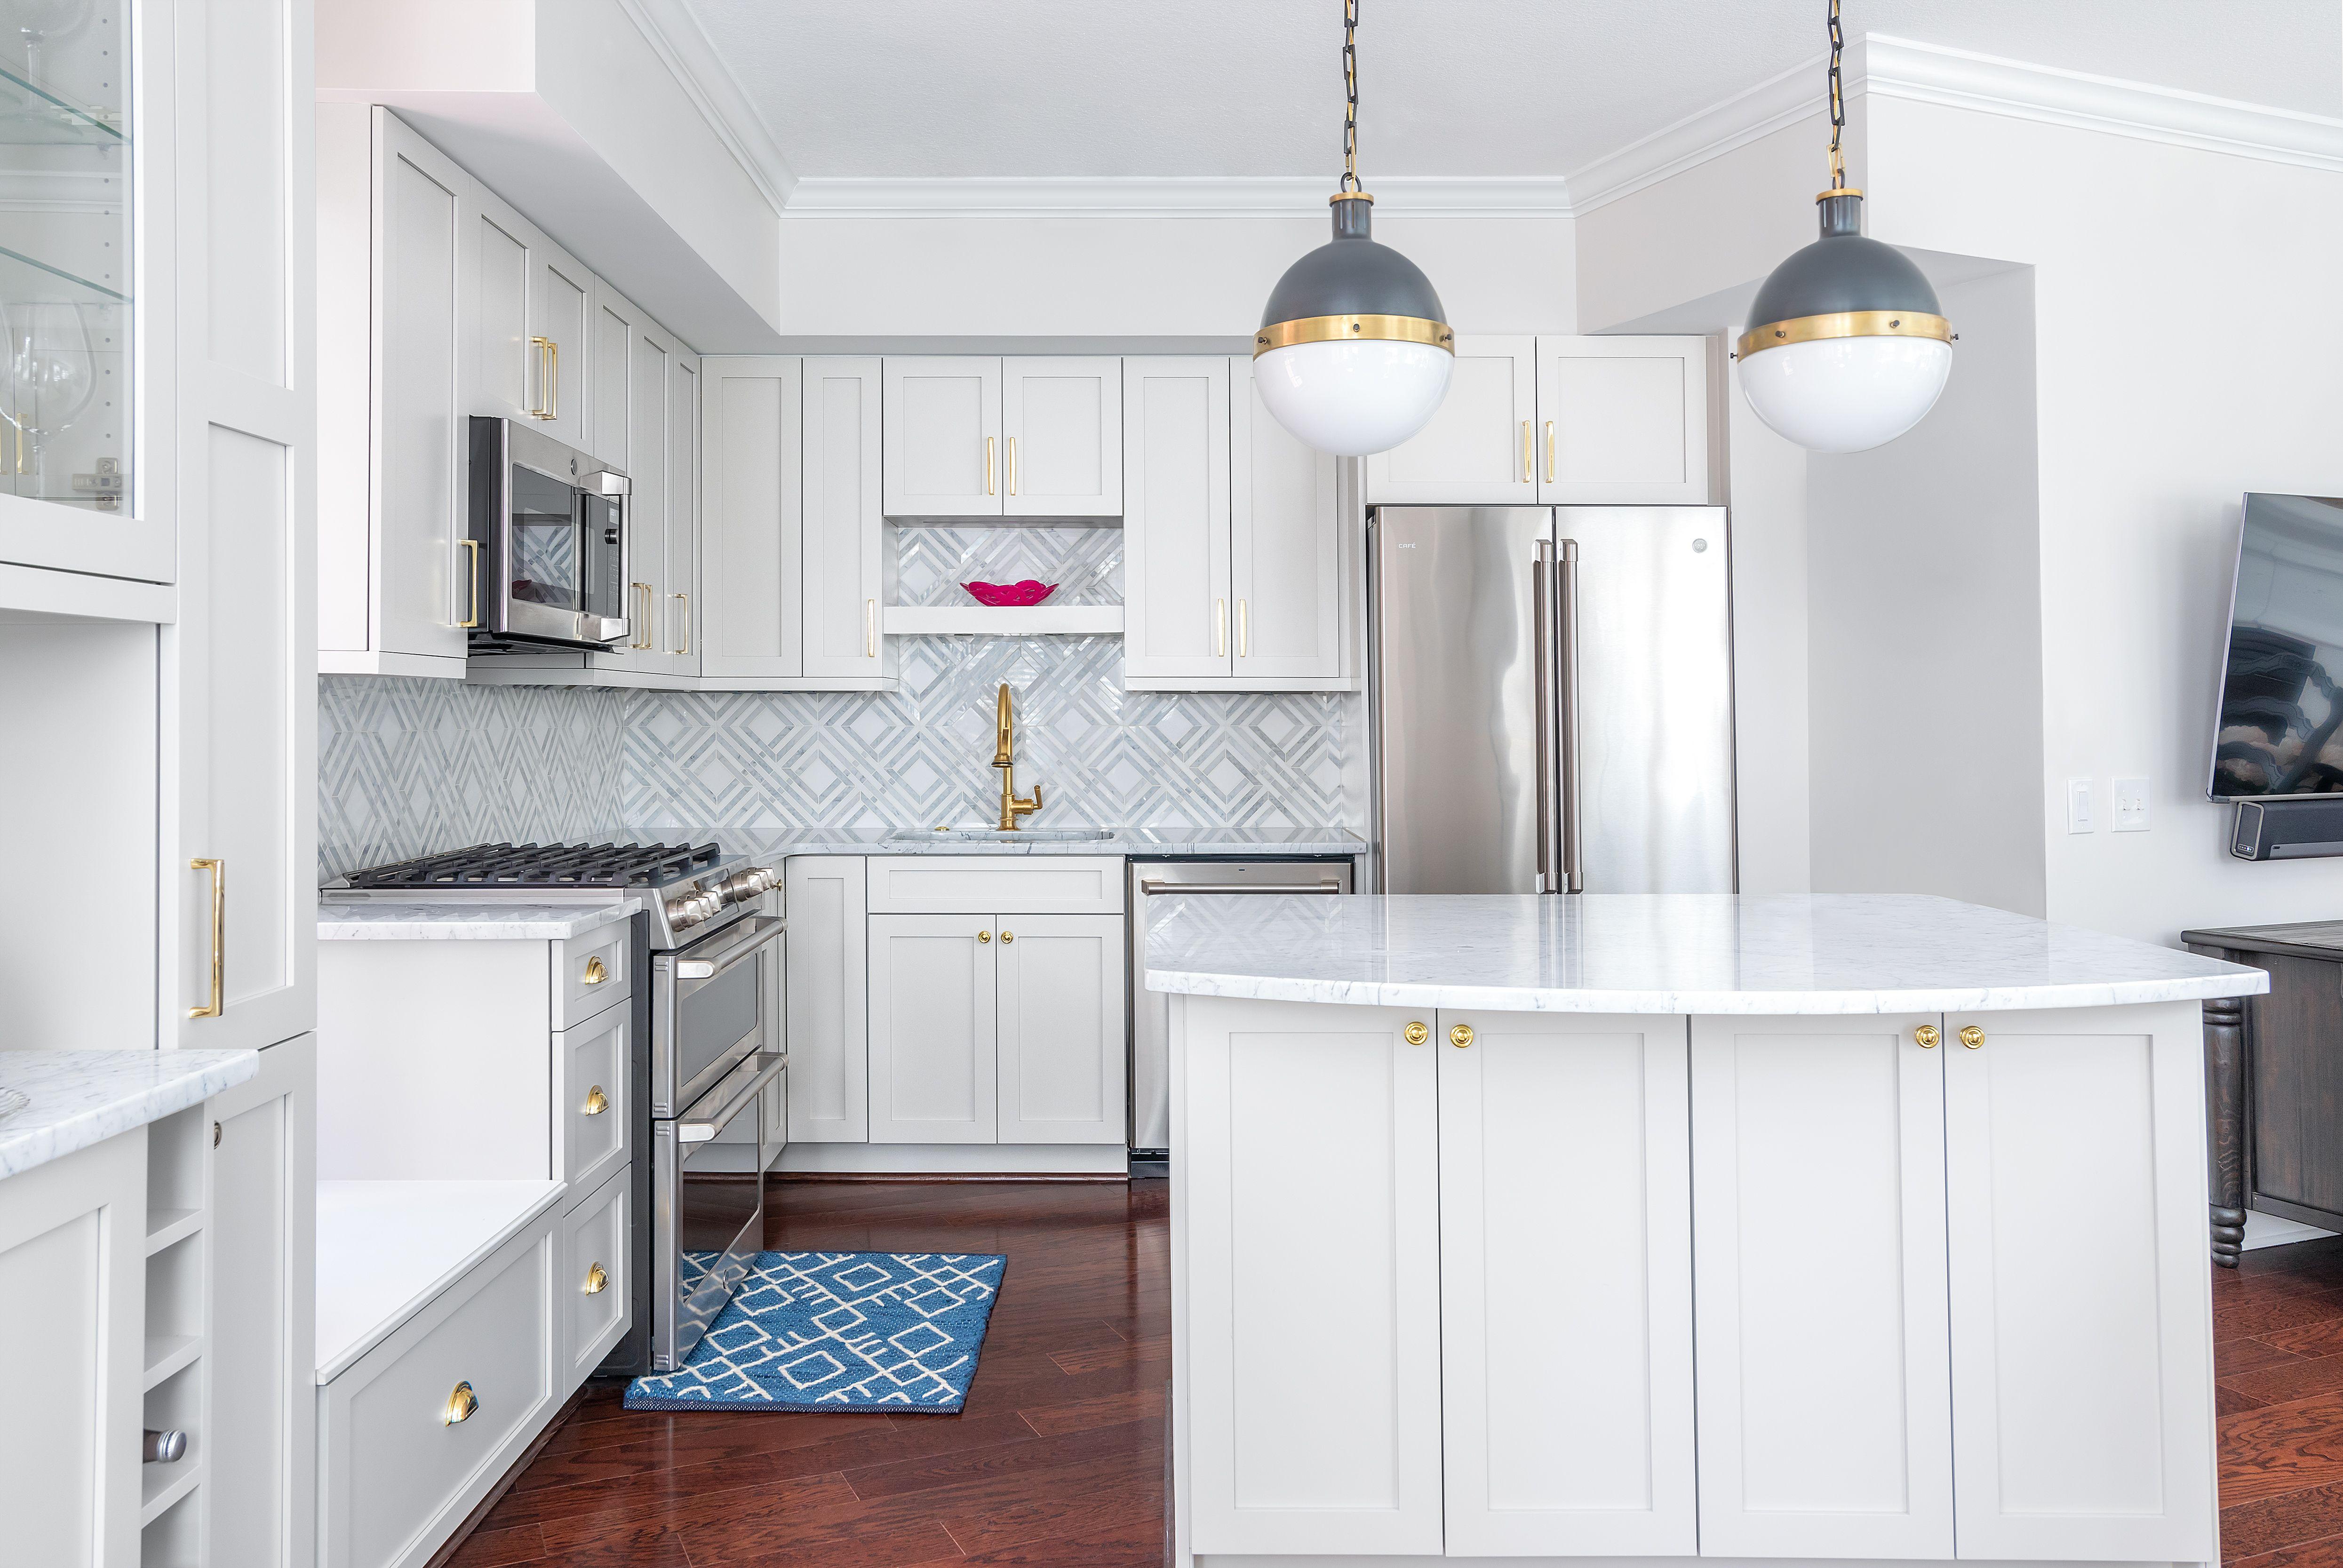 Best White Kitchen Cabinets Design Countertops Ideas In 2020 Custom Kitchen Remodel Kitchen Cabinet Design Countertop Design